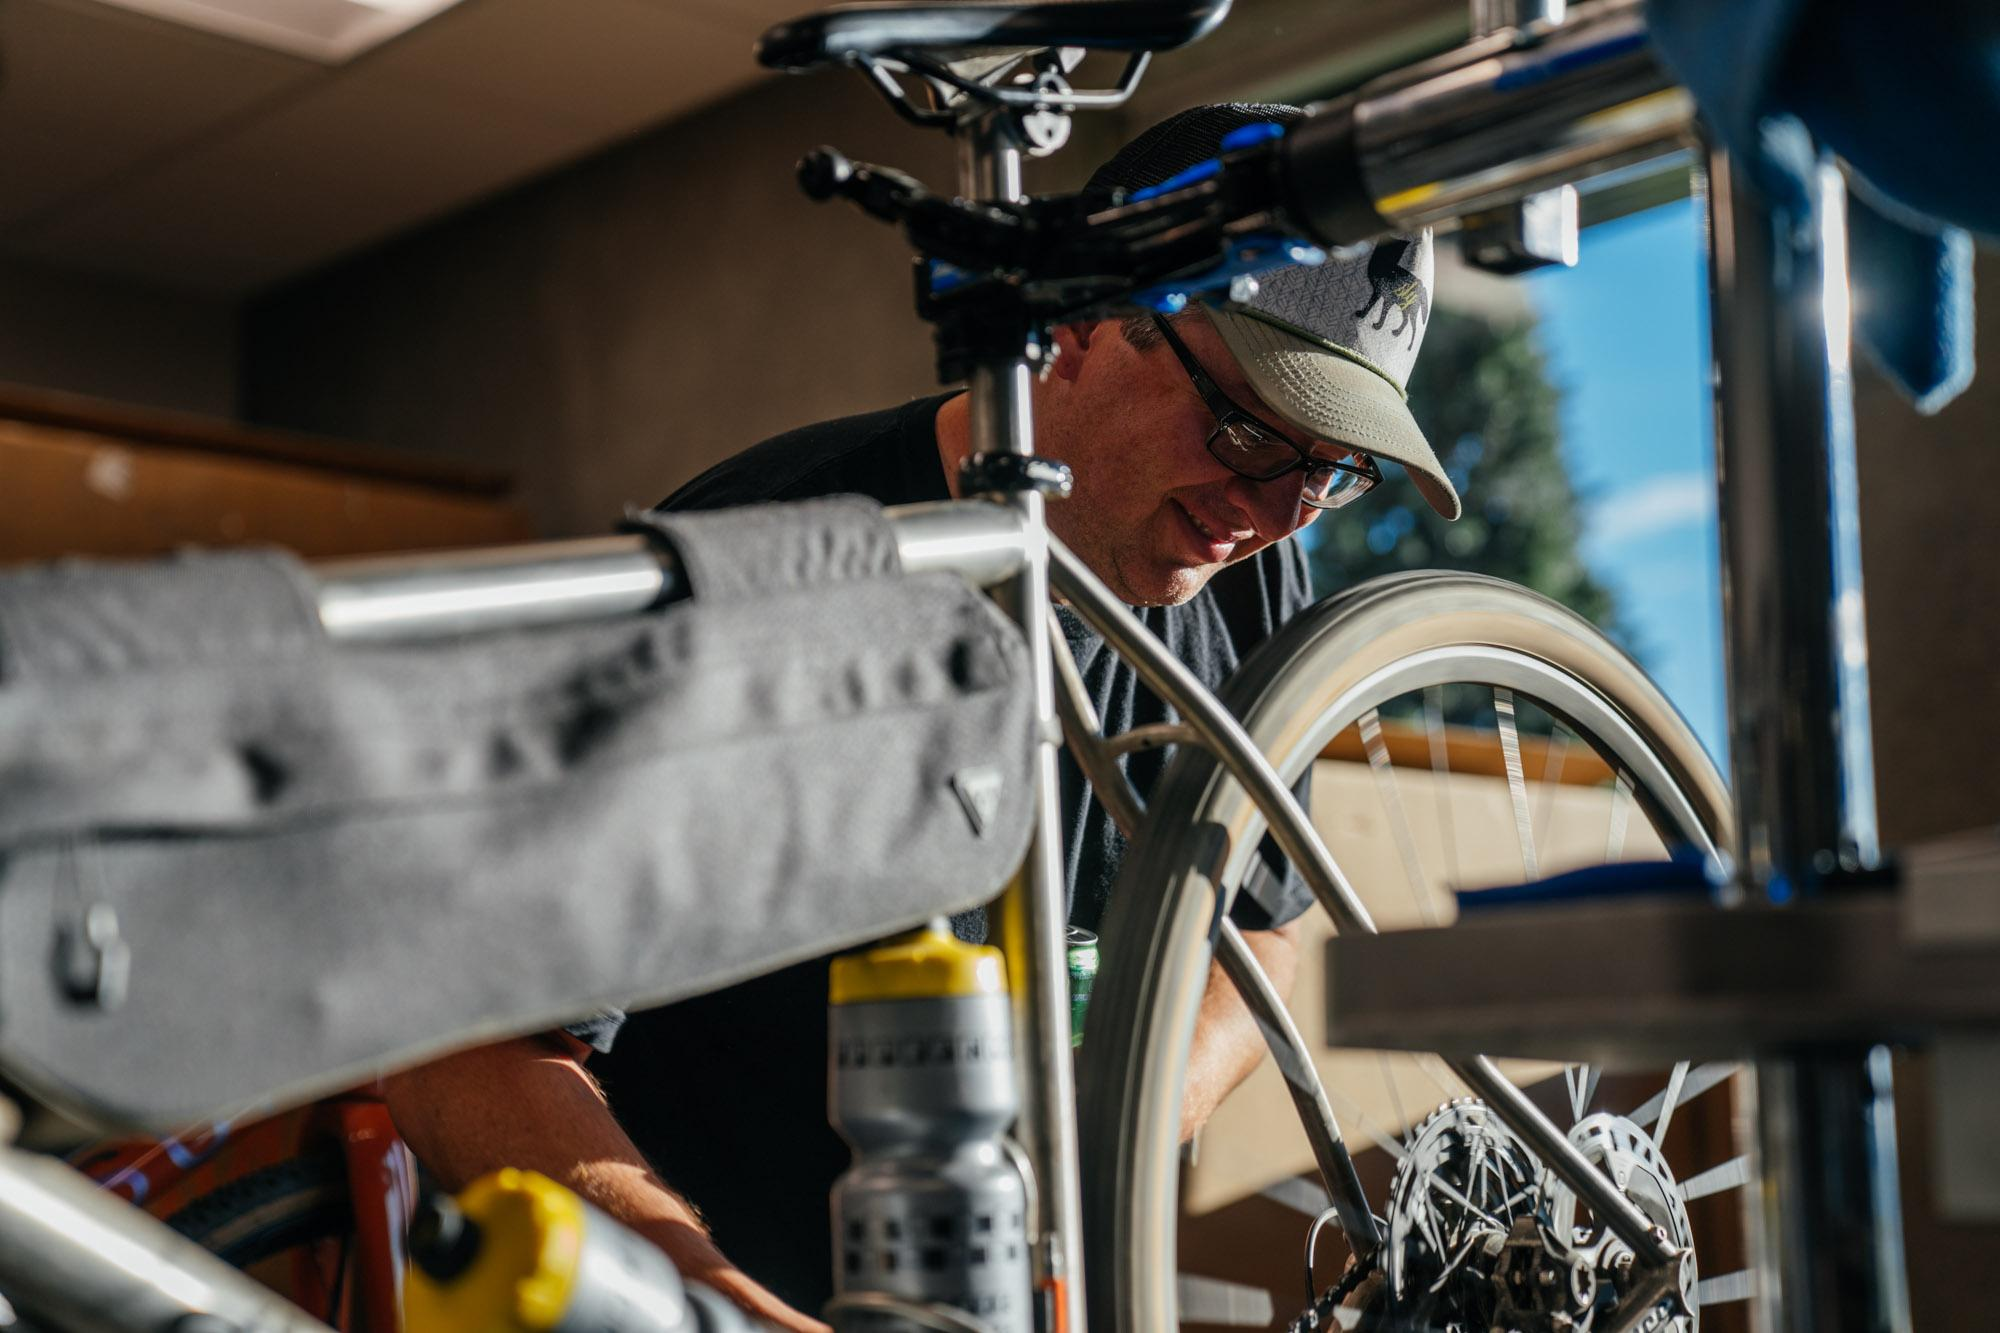 Erik from Alliance setting up his bike.